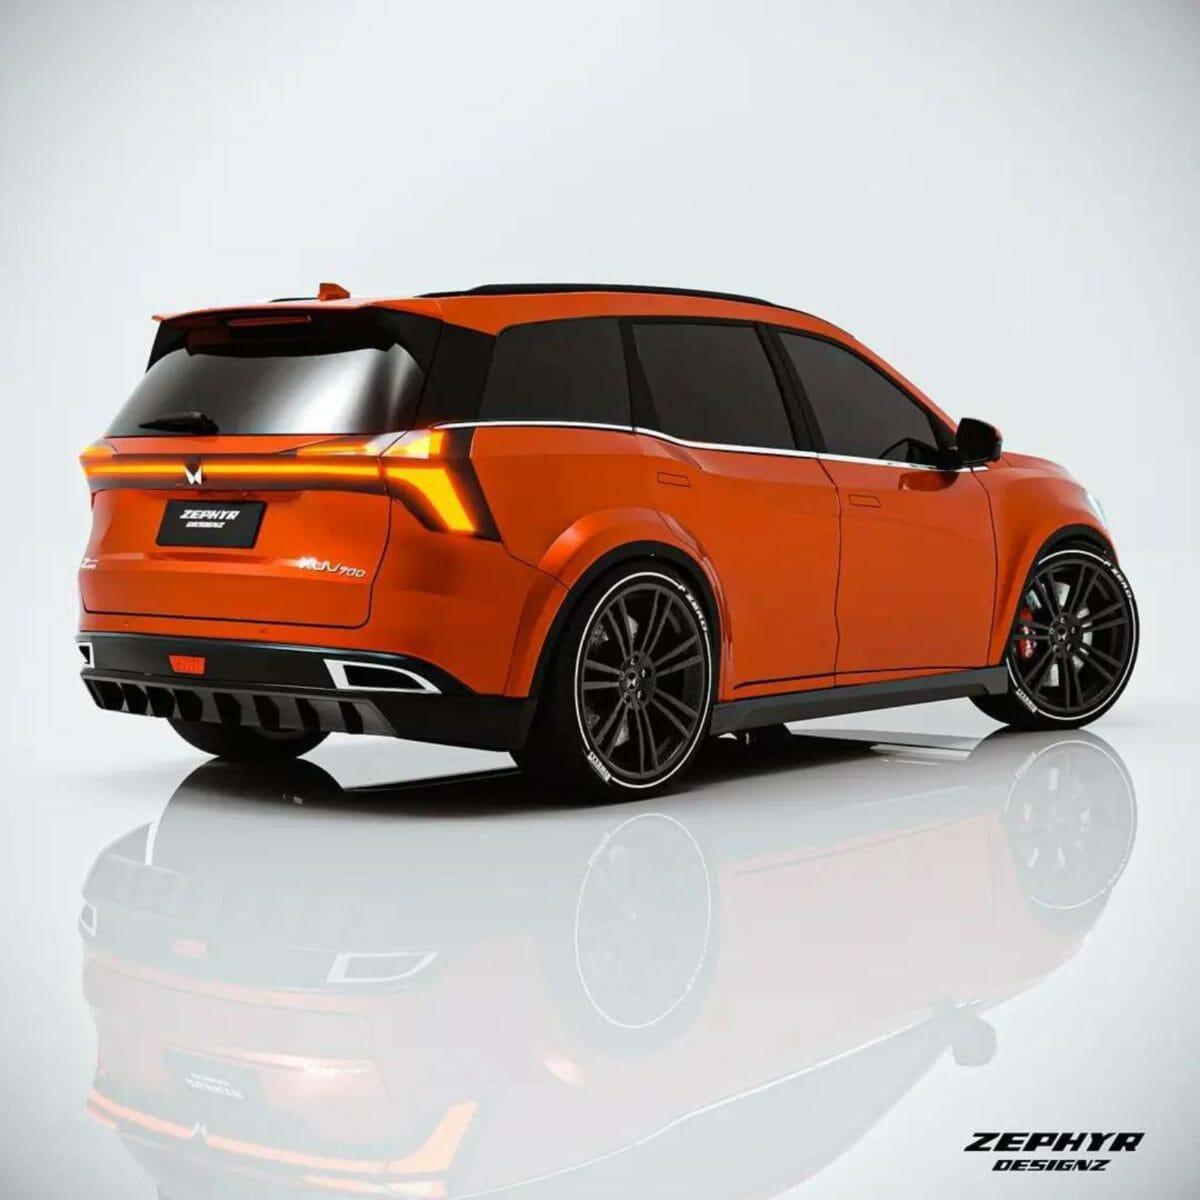 xuv700 sports edition render rear